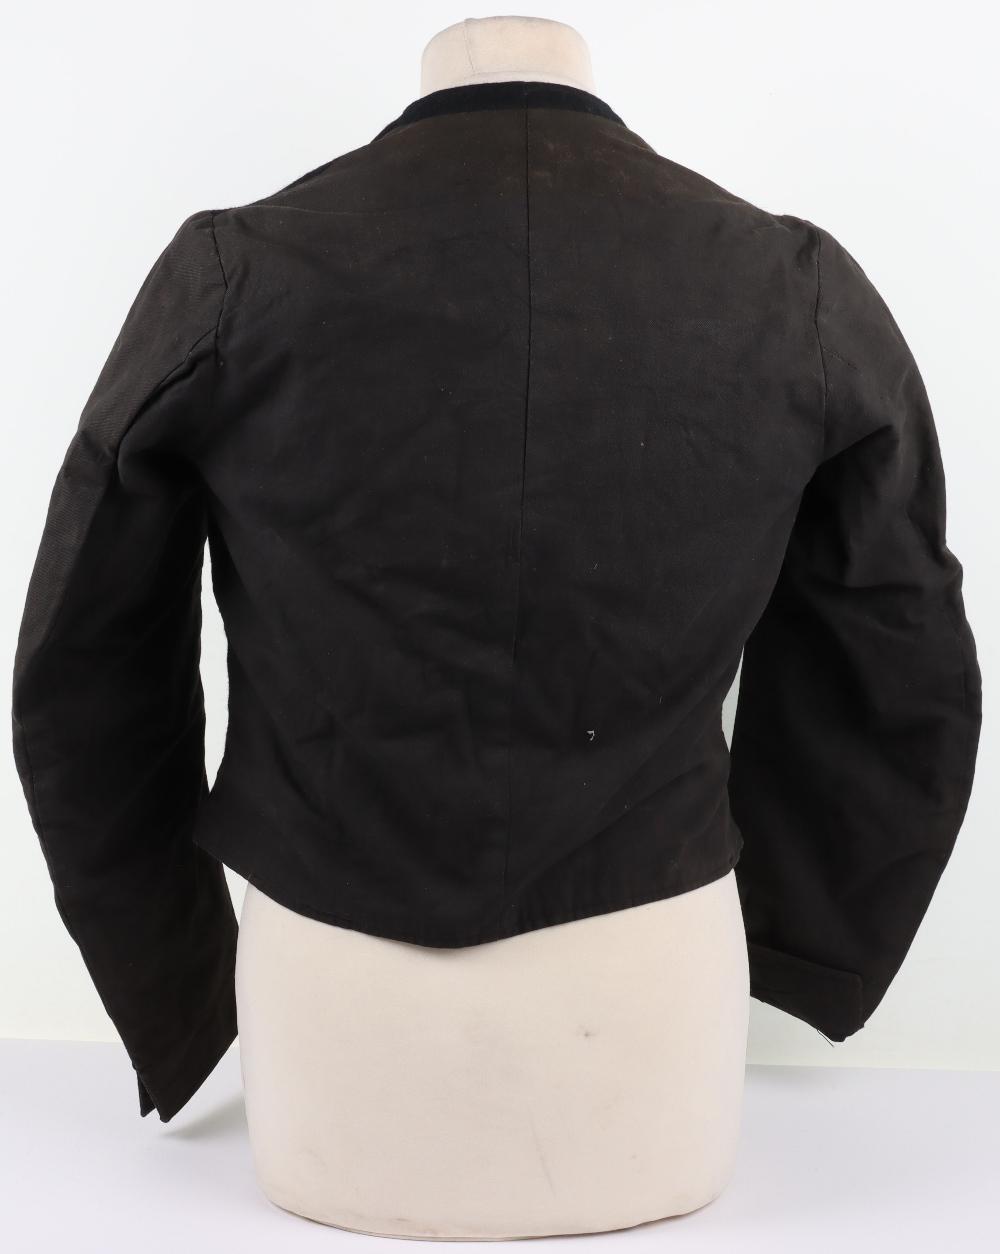 A London, Midland & Scottish and London North Eastern Railway porter's jacket, circa 1930 - Image 6 of 13